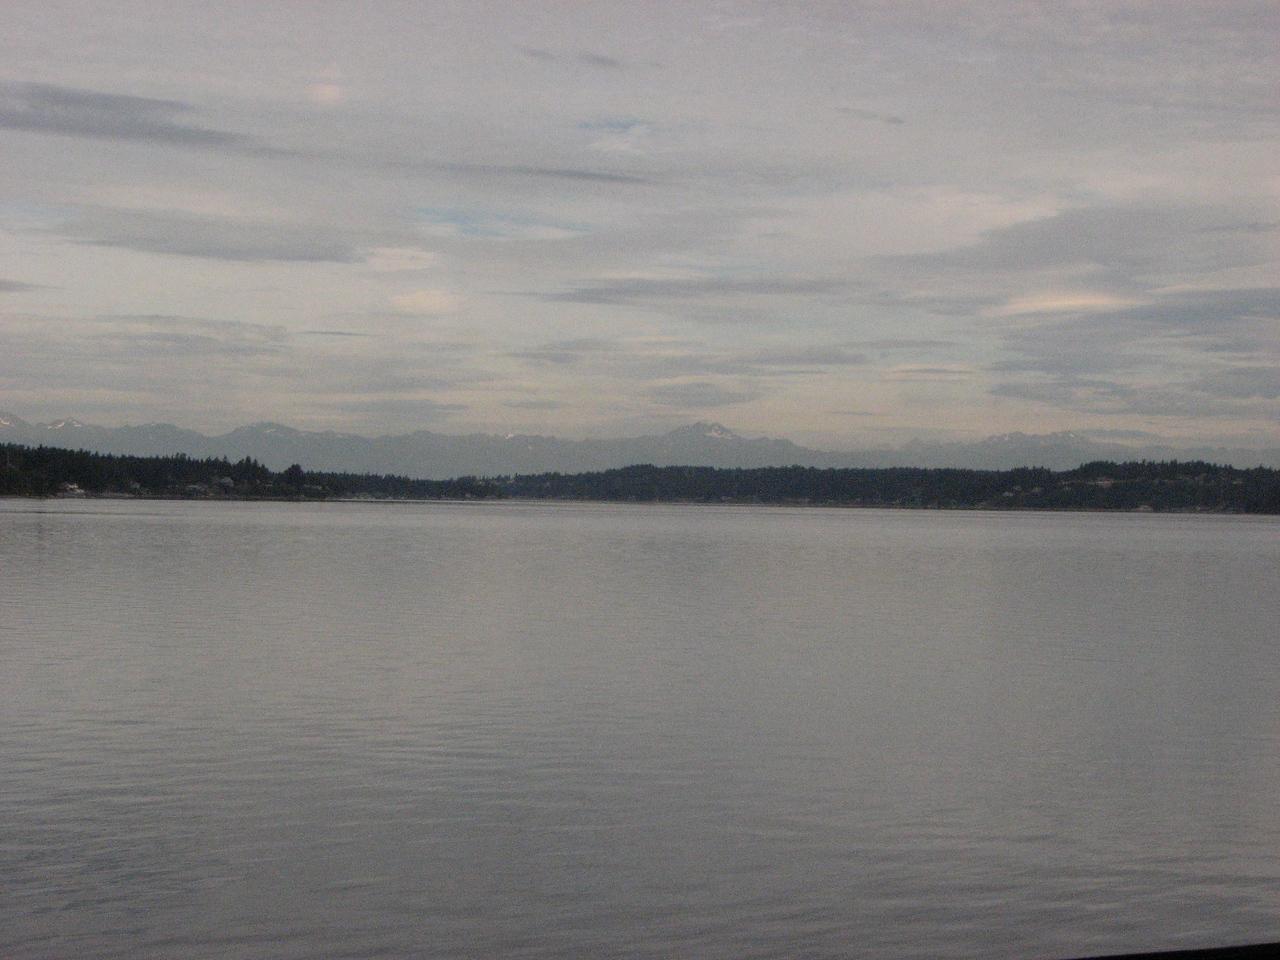 Riding along South Puget Sound